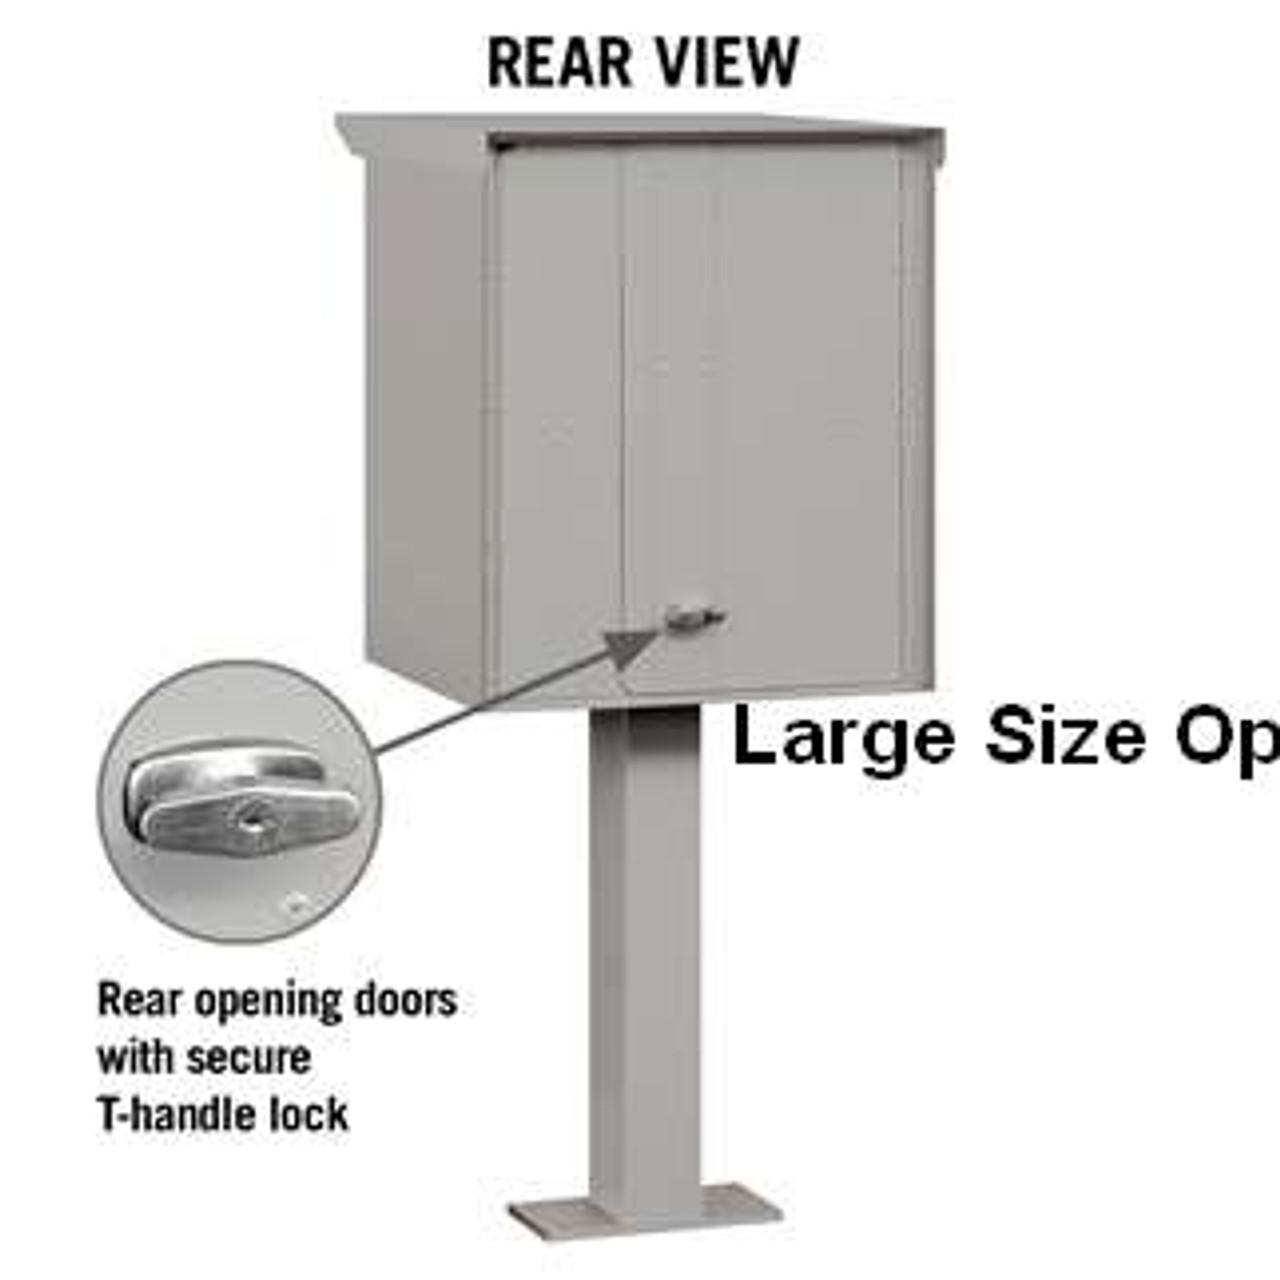 Large Envelope Drop Box Locking Parcel Drop Boxes